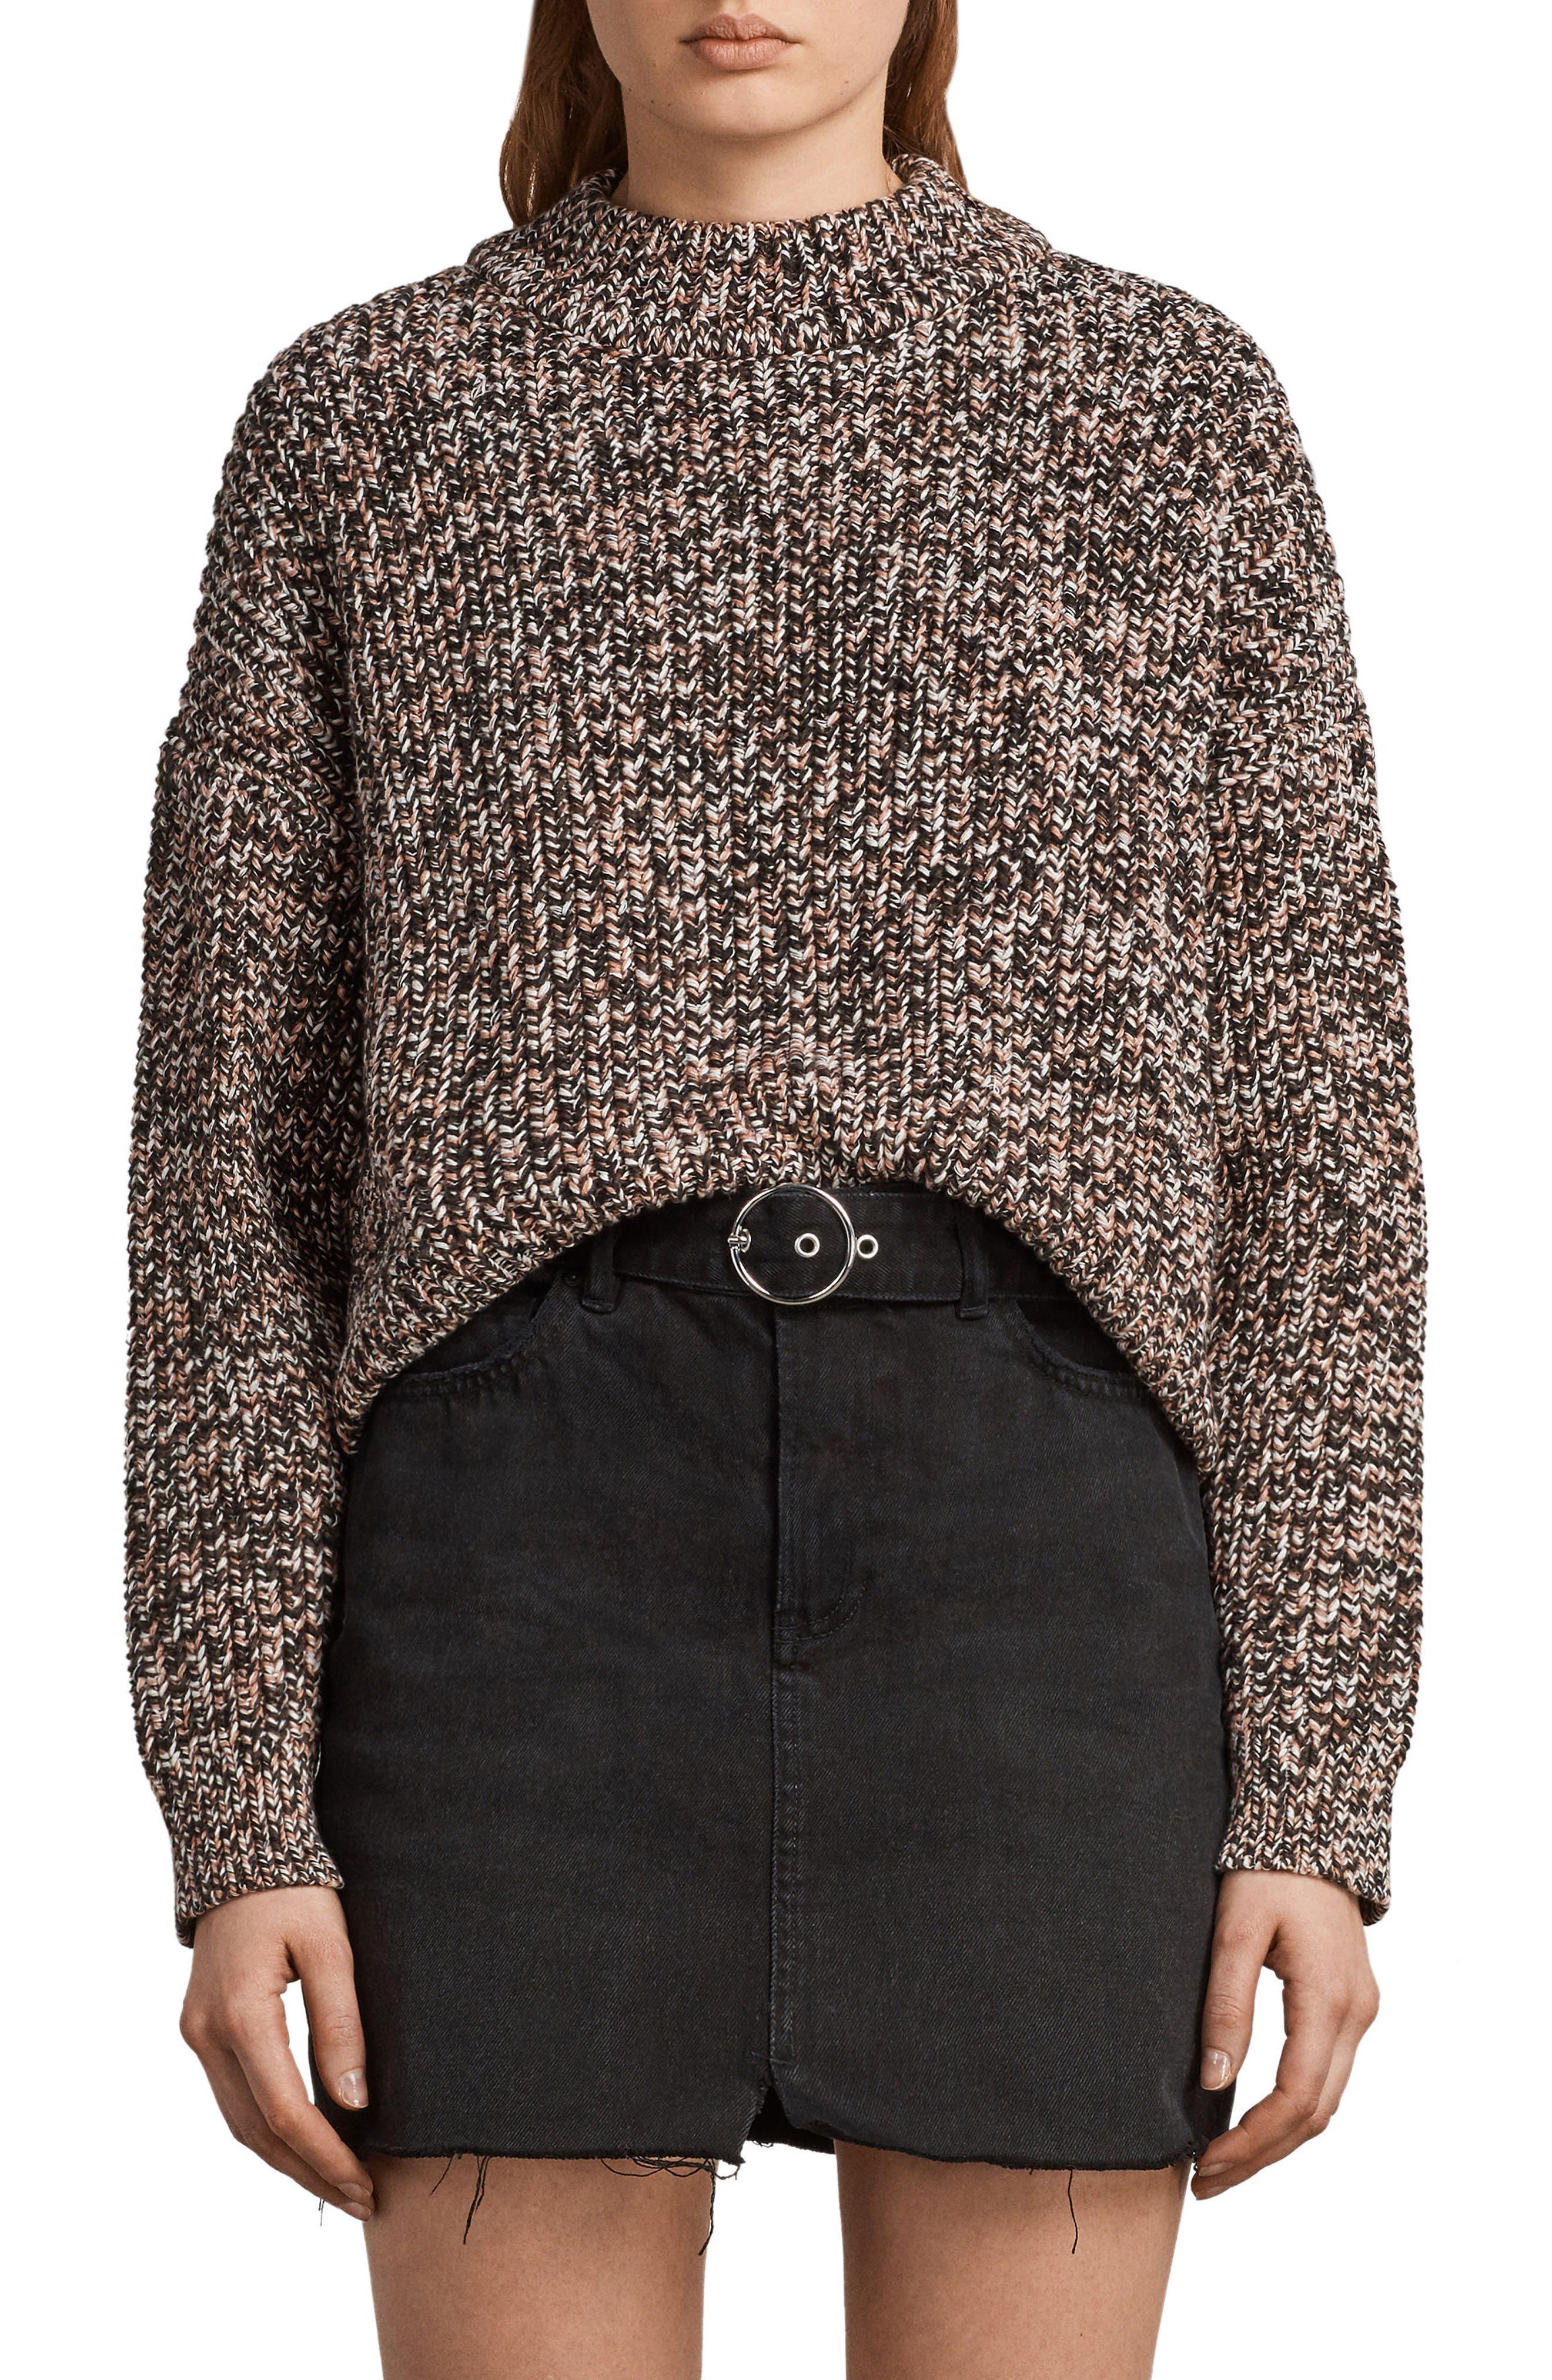 Malu Knit Sweater,                             Main thumbnail 1, color,                             Pink Mix